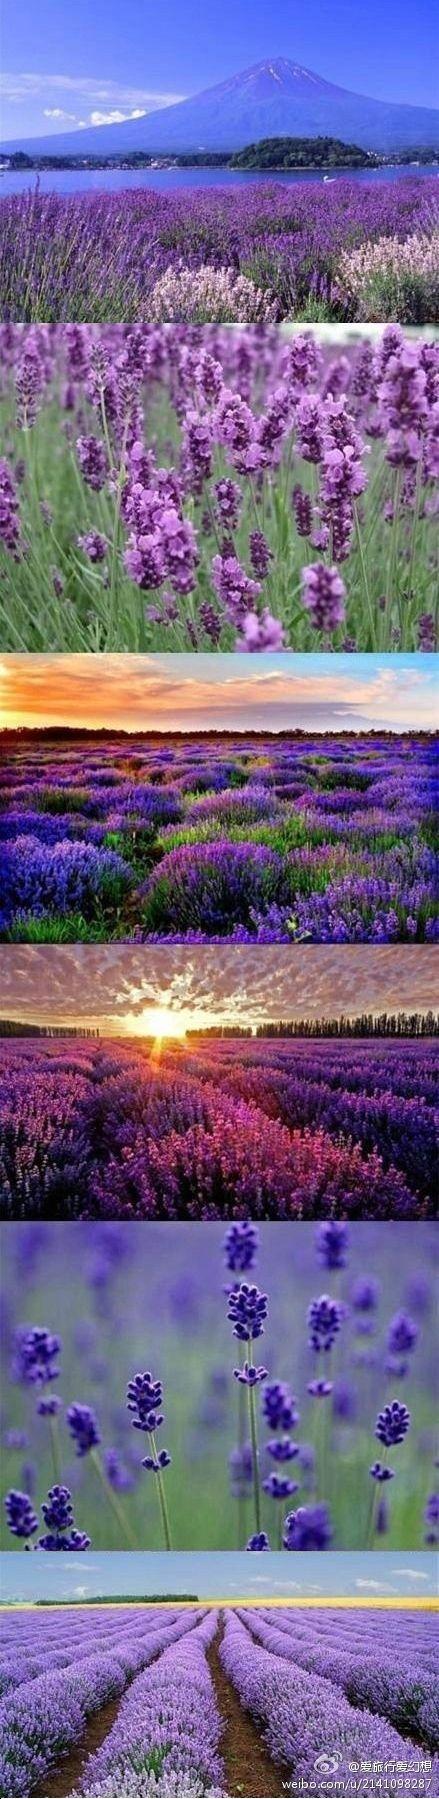 Lavendar fields  @MissMandalas #lavender #provance #france